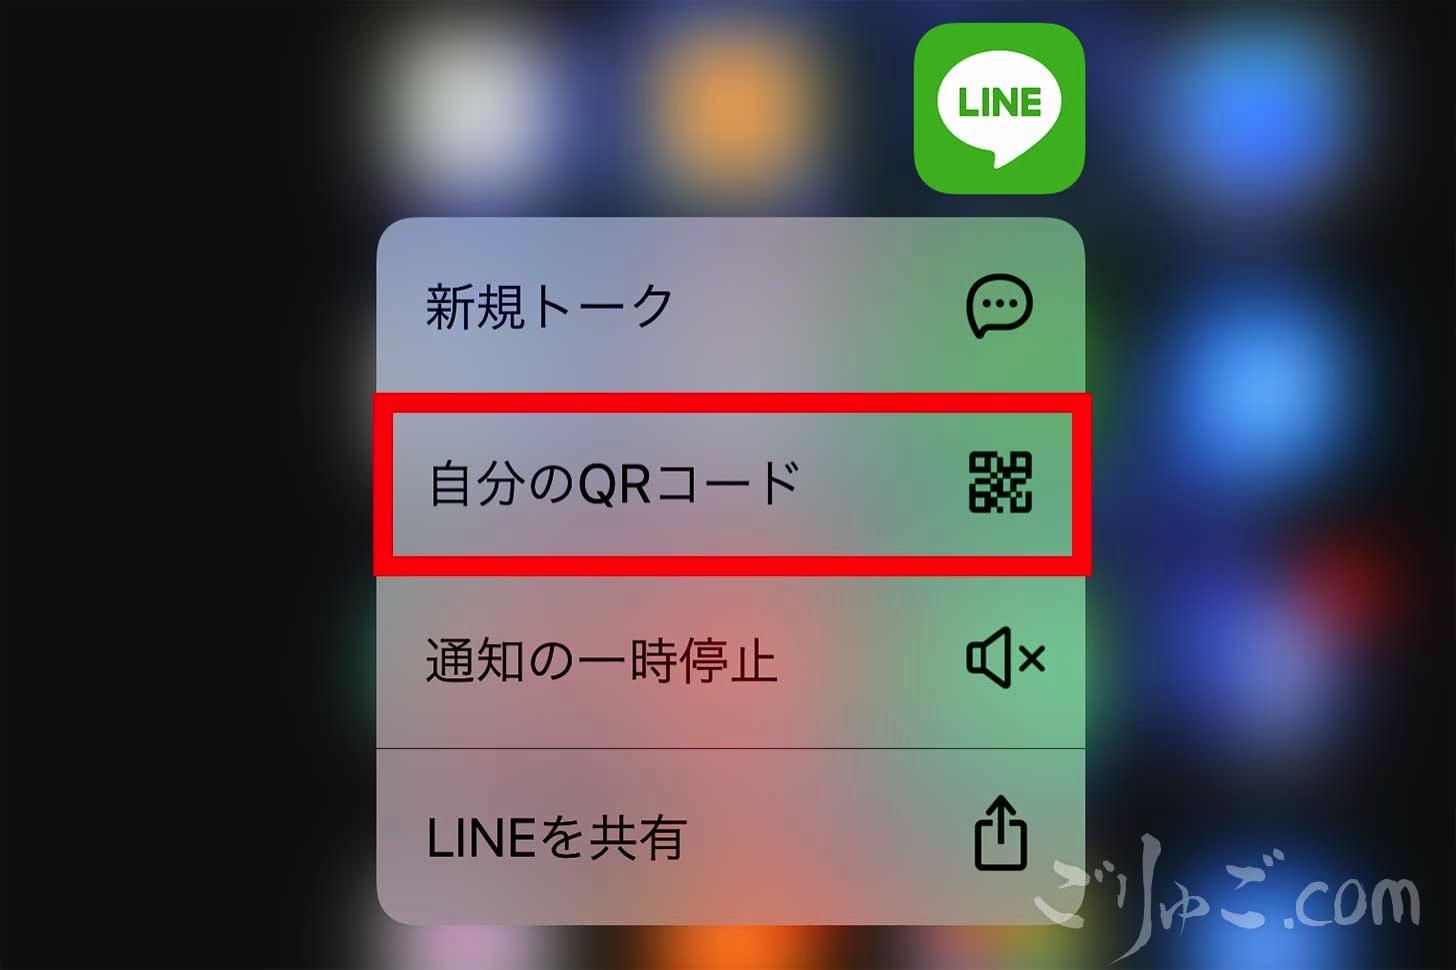 LINEでQRコード